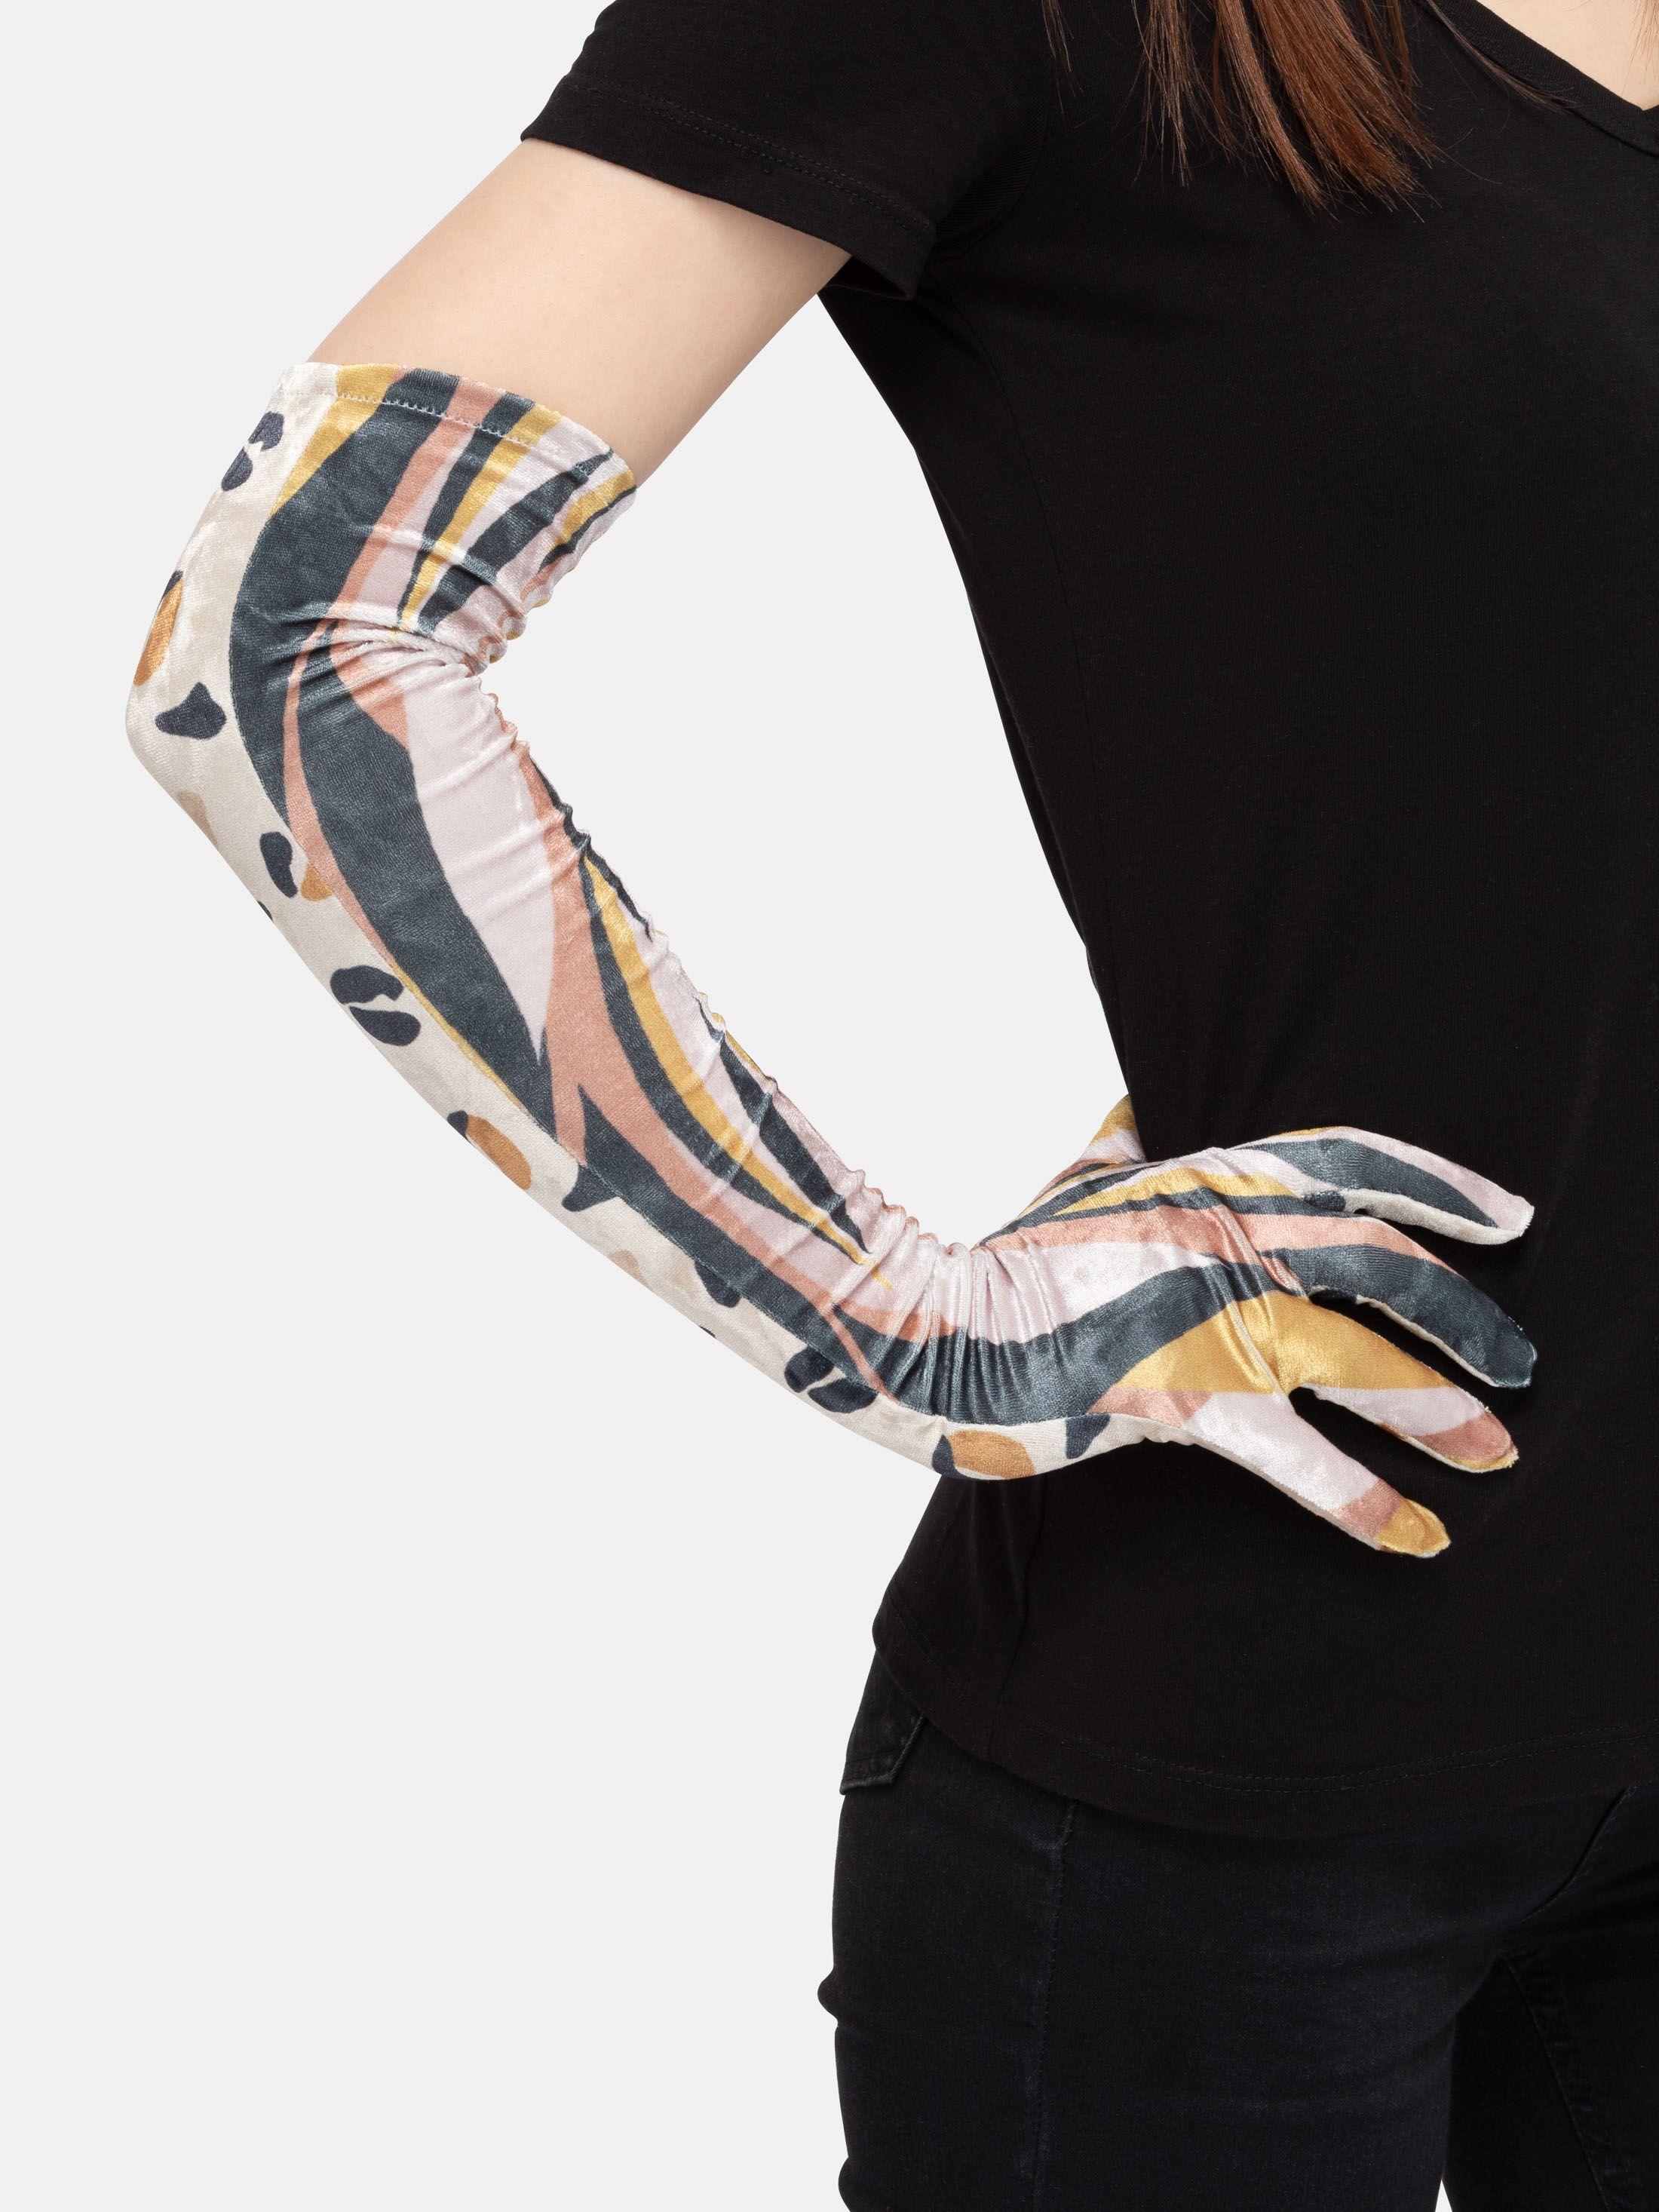 custom opera gloves au